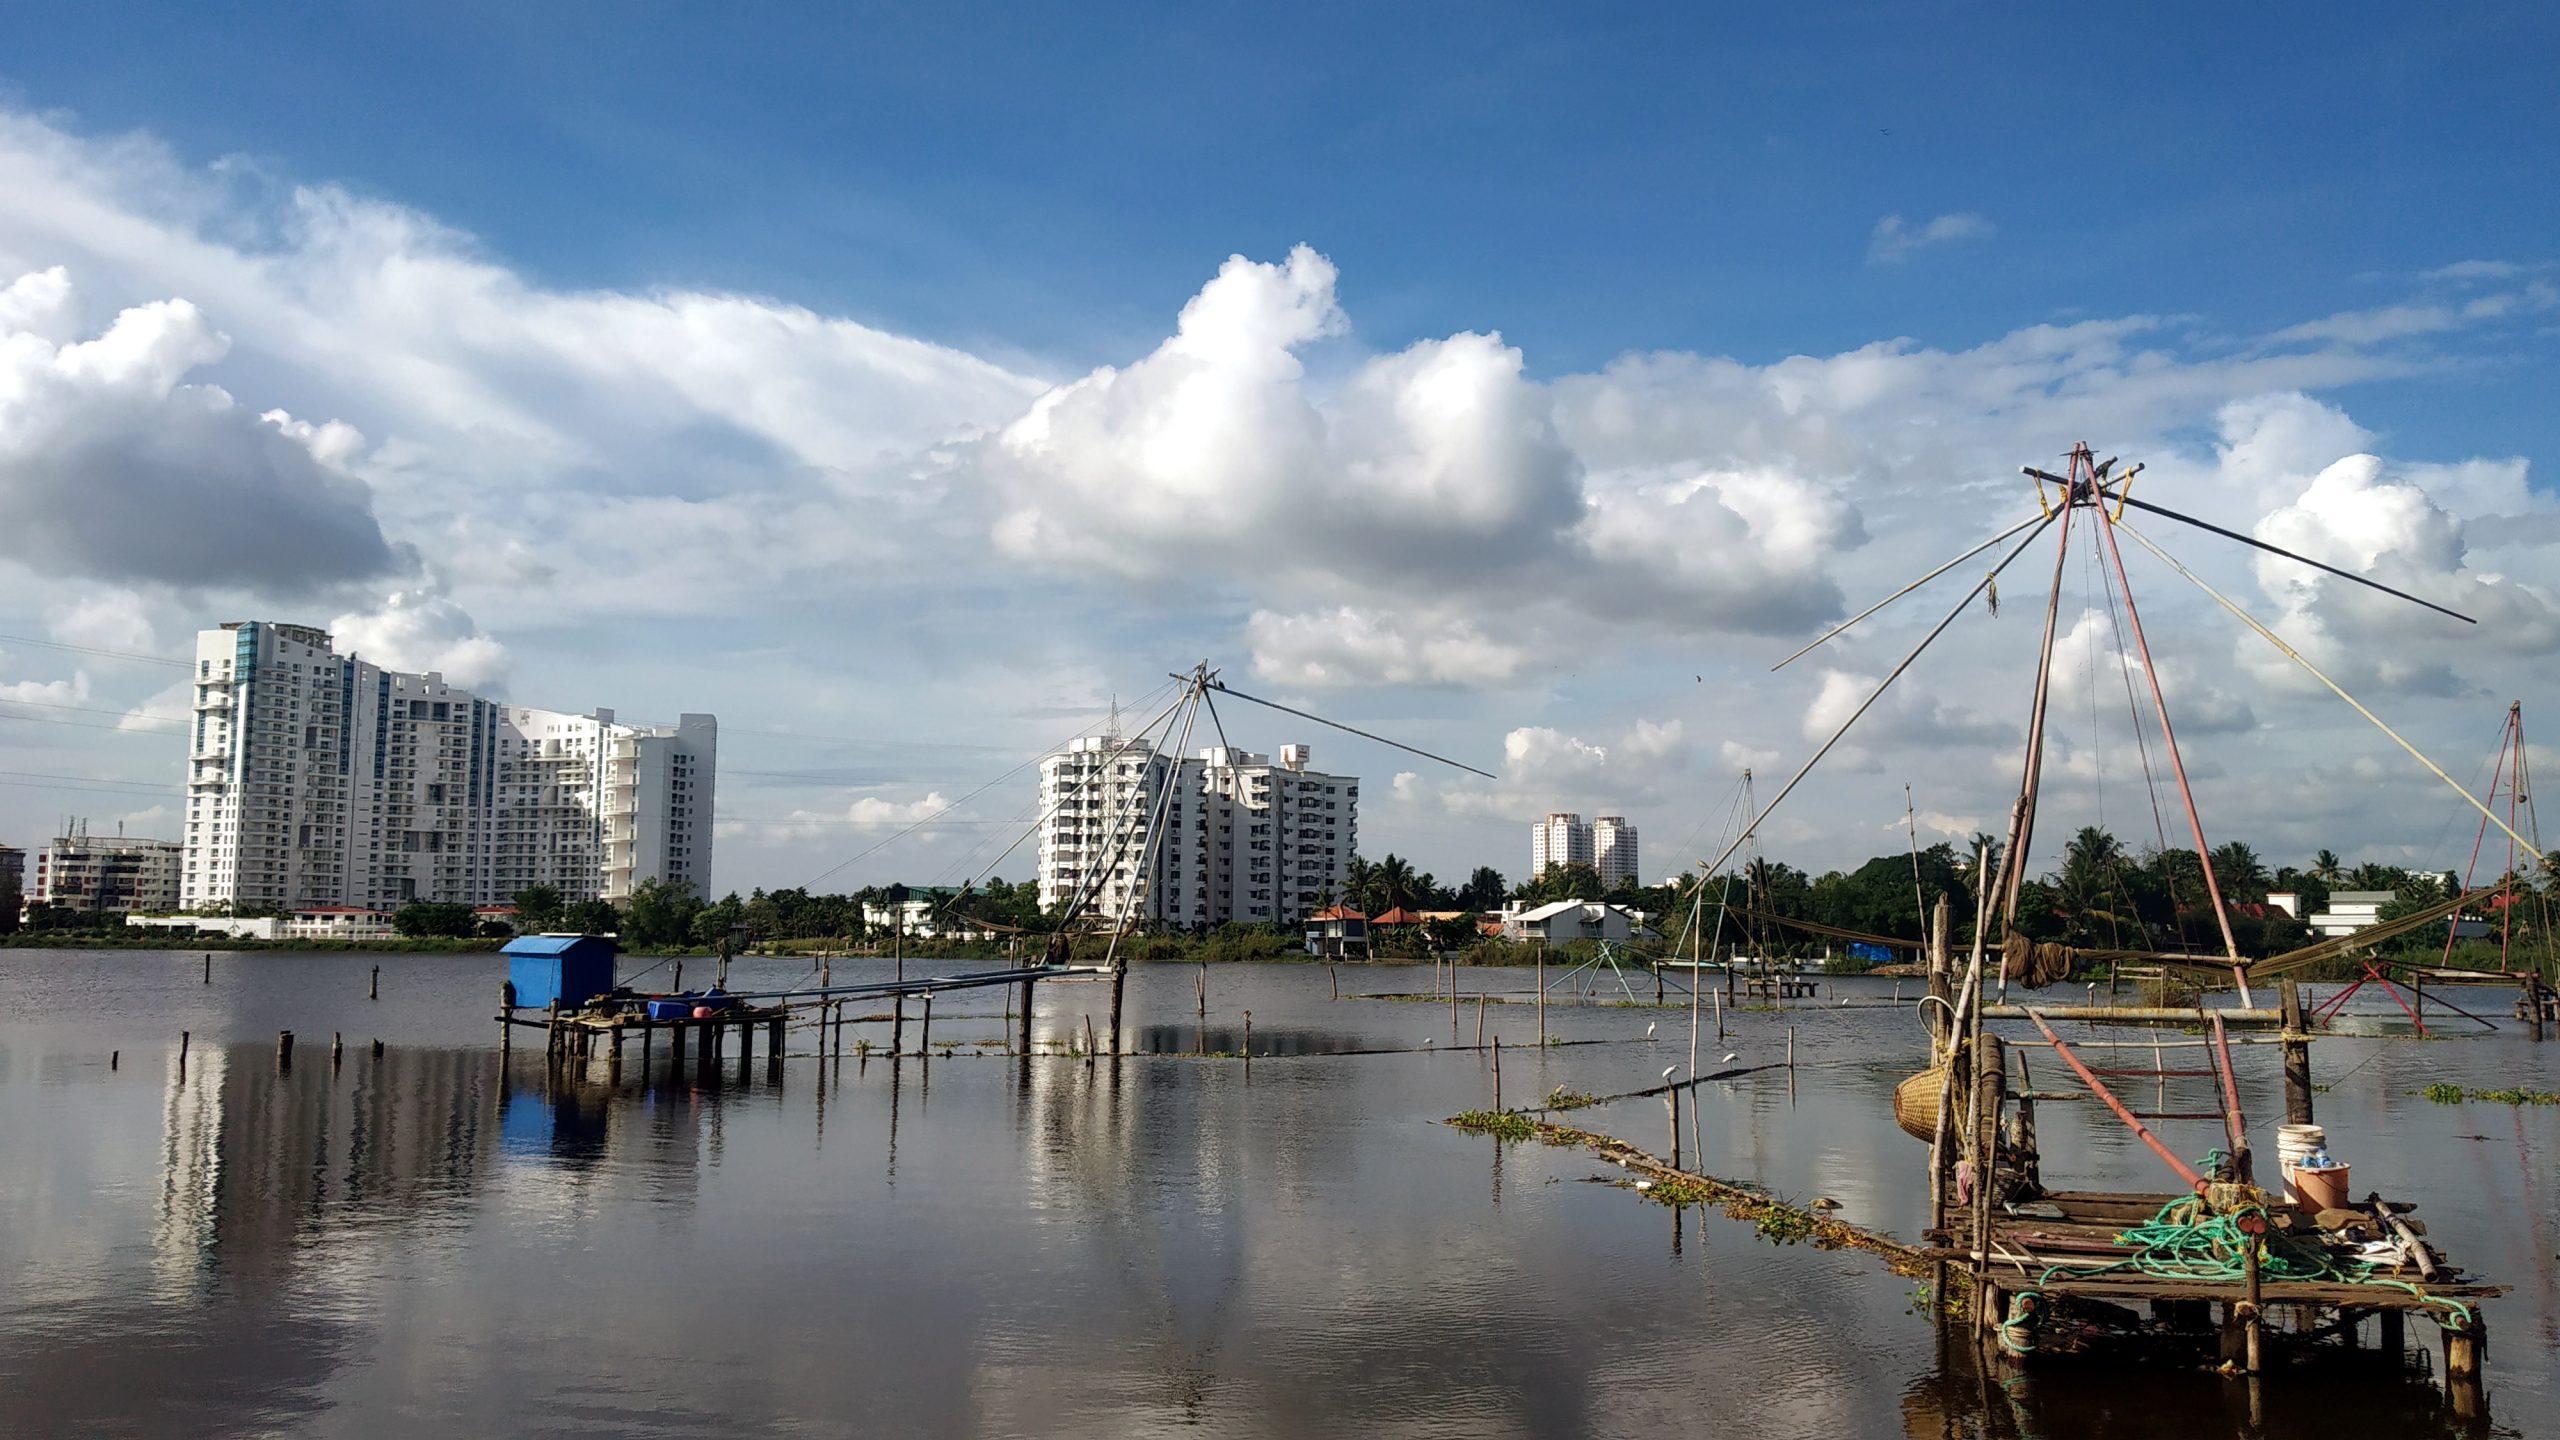 Chilavannor Lake in Kochi